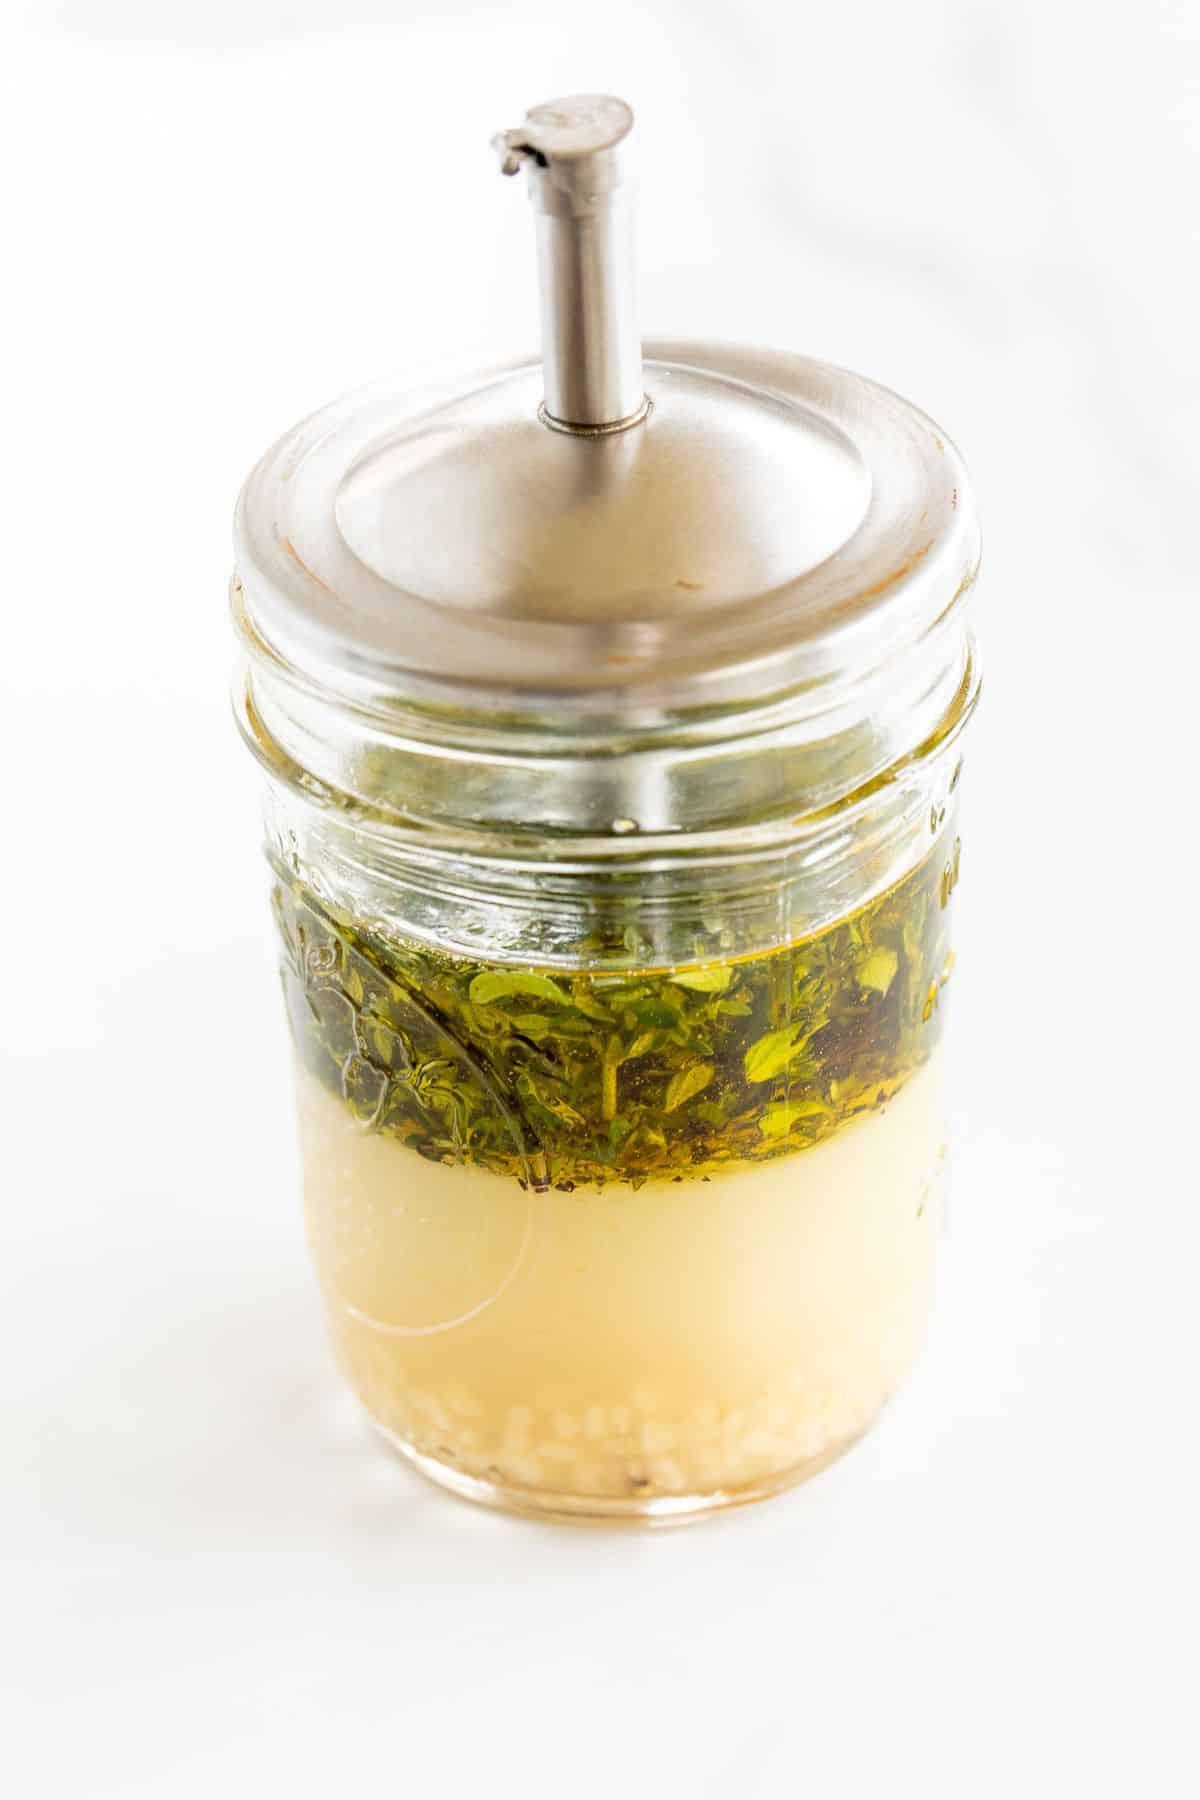 A clear glass mason jar full of Greek chicken marinade.